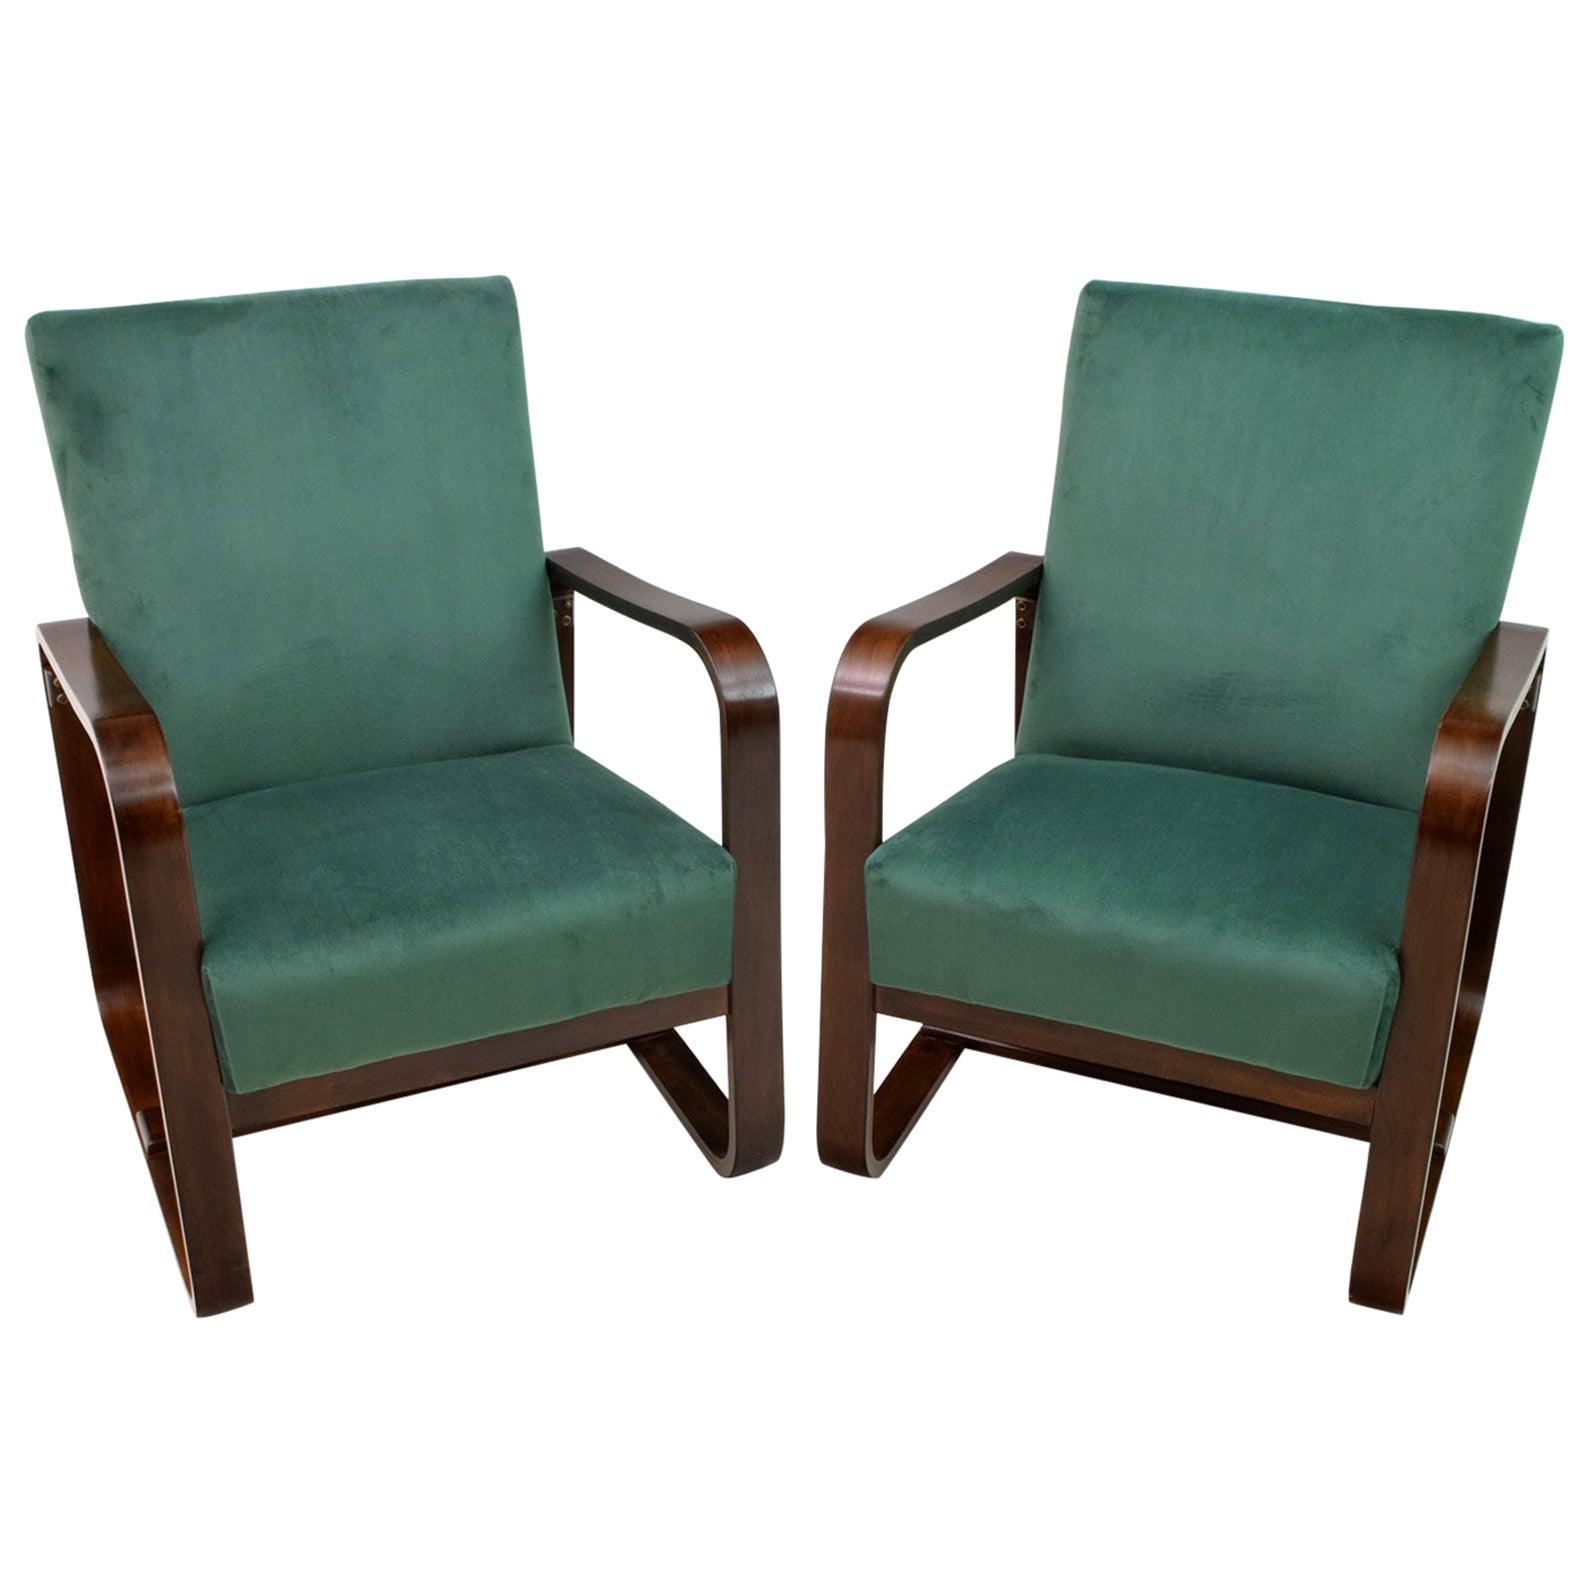 Pair of Rare Giuseppe Pagano & Gino Maggioni Bentwood Armchairs, 1940s